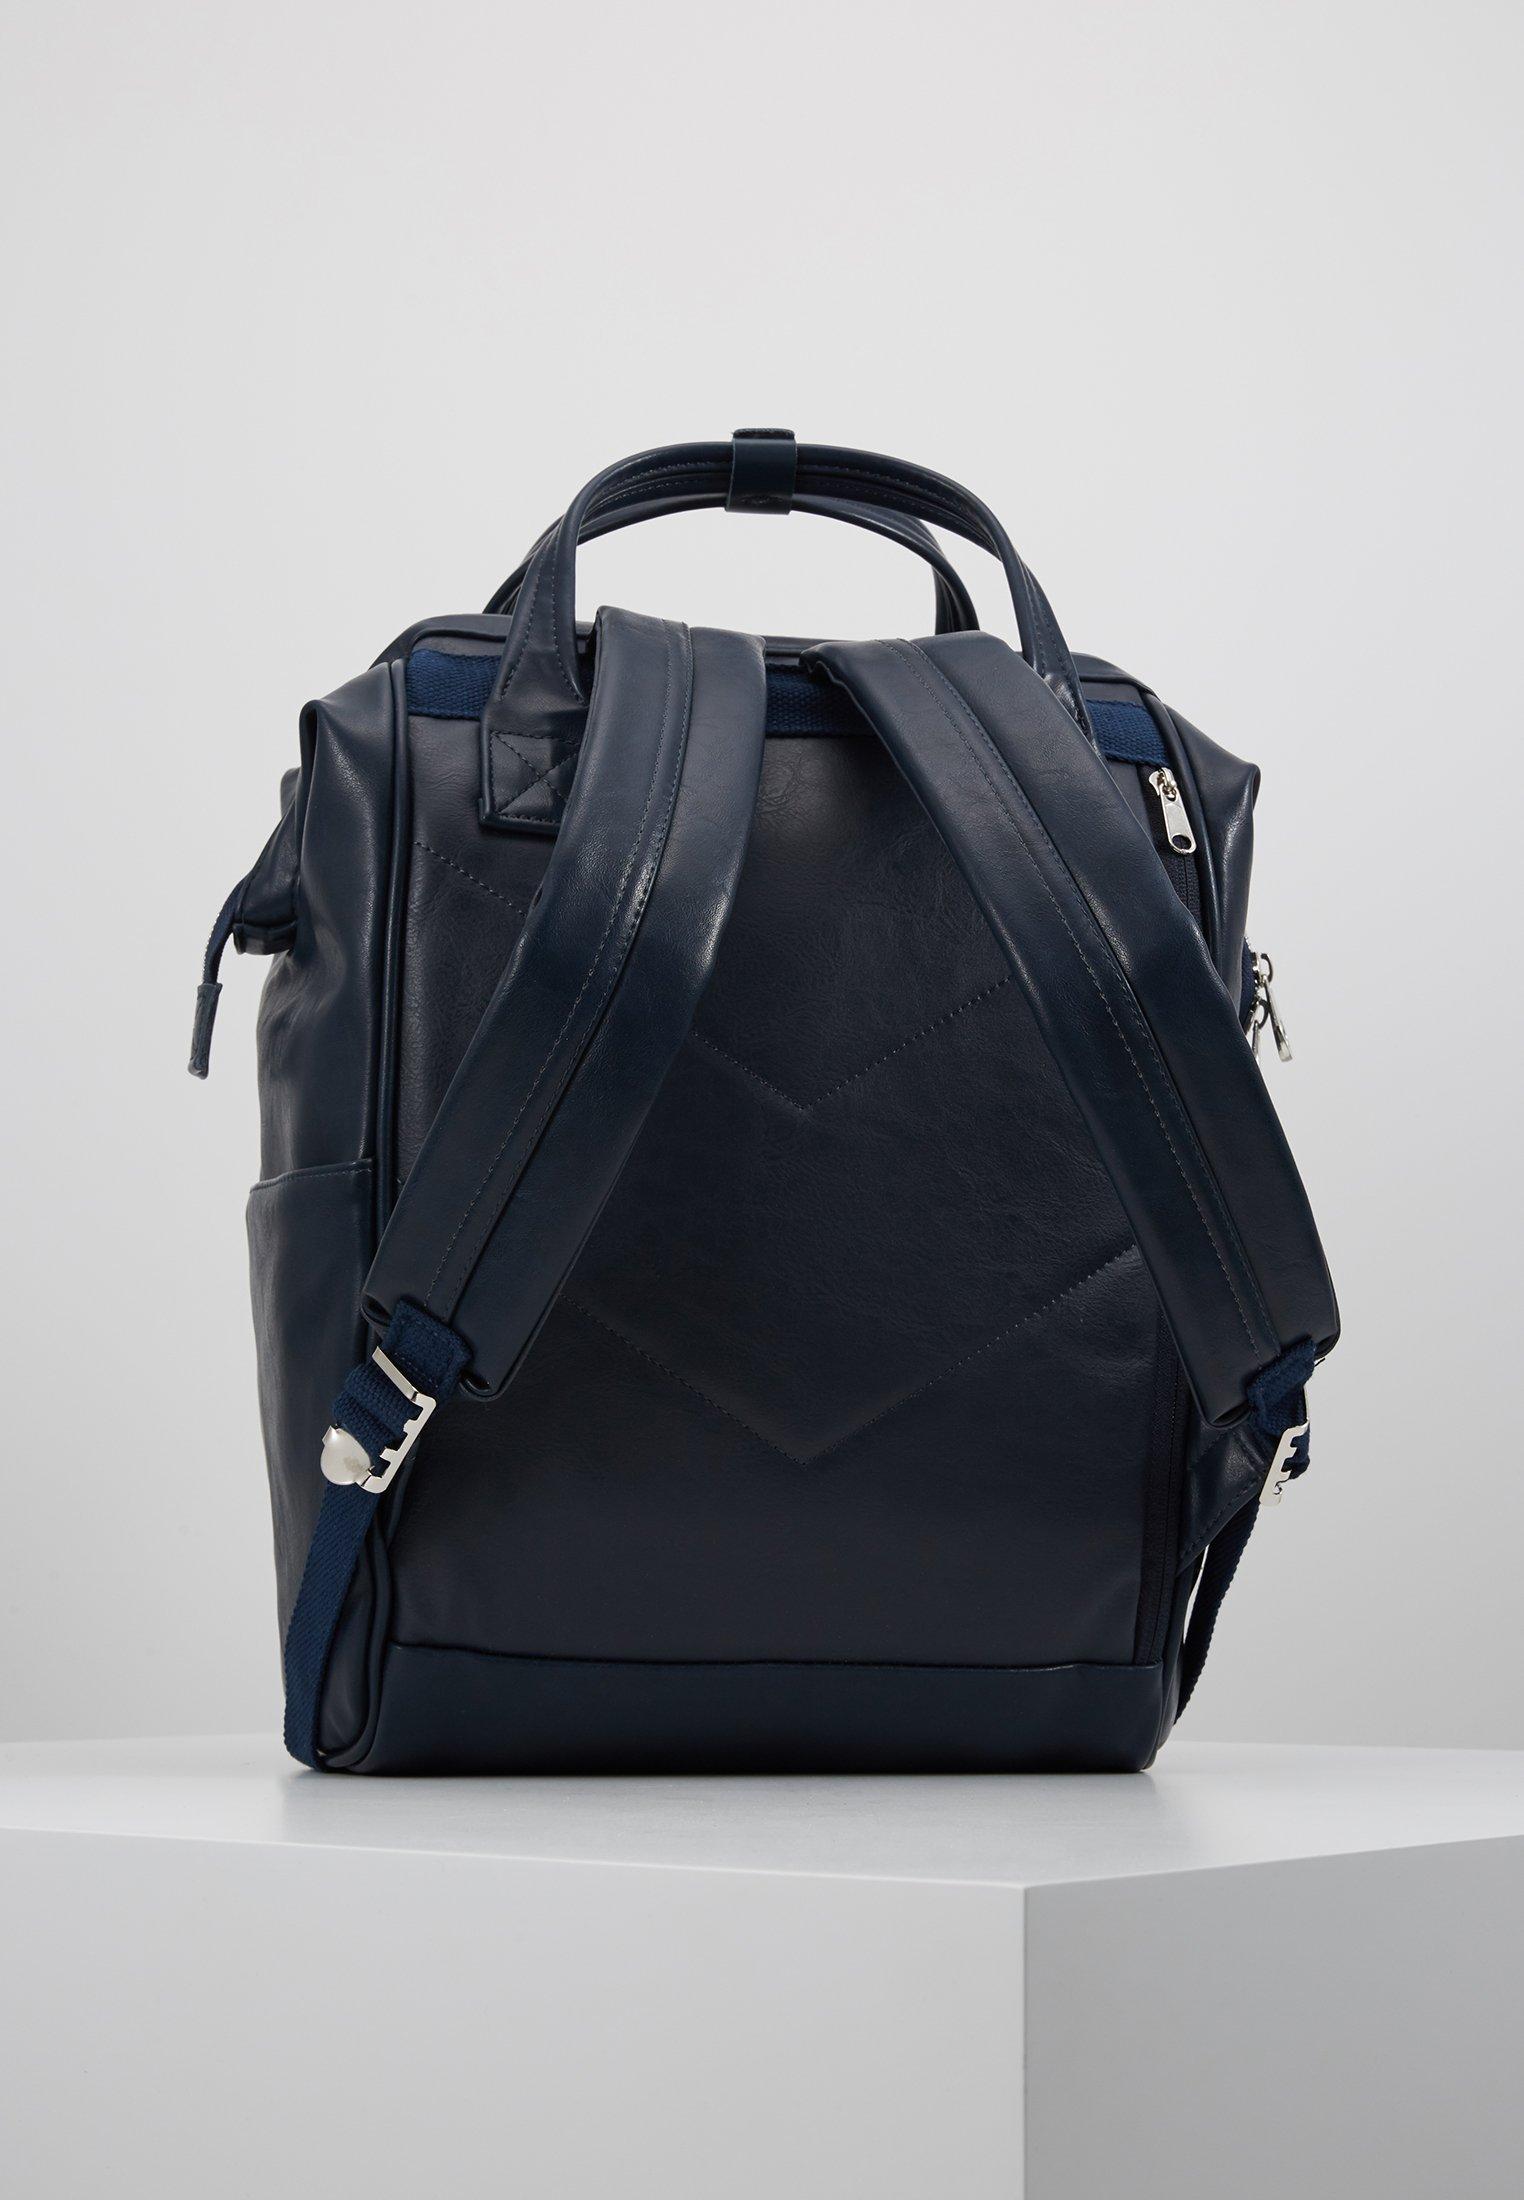 Anello Vegan Backpack - Tagesrucksack Dark Blue Black Friday